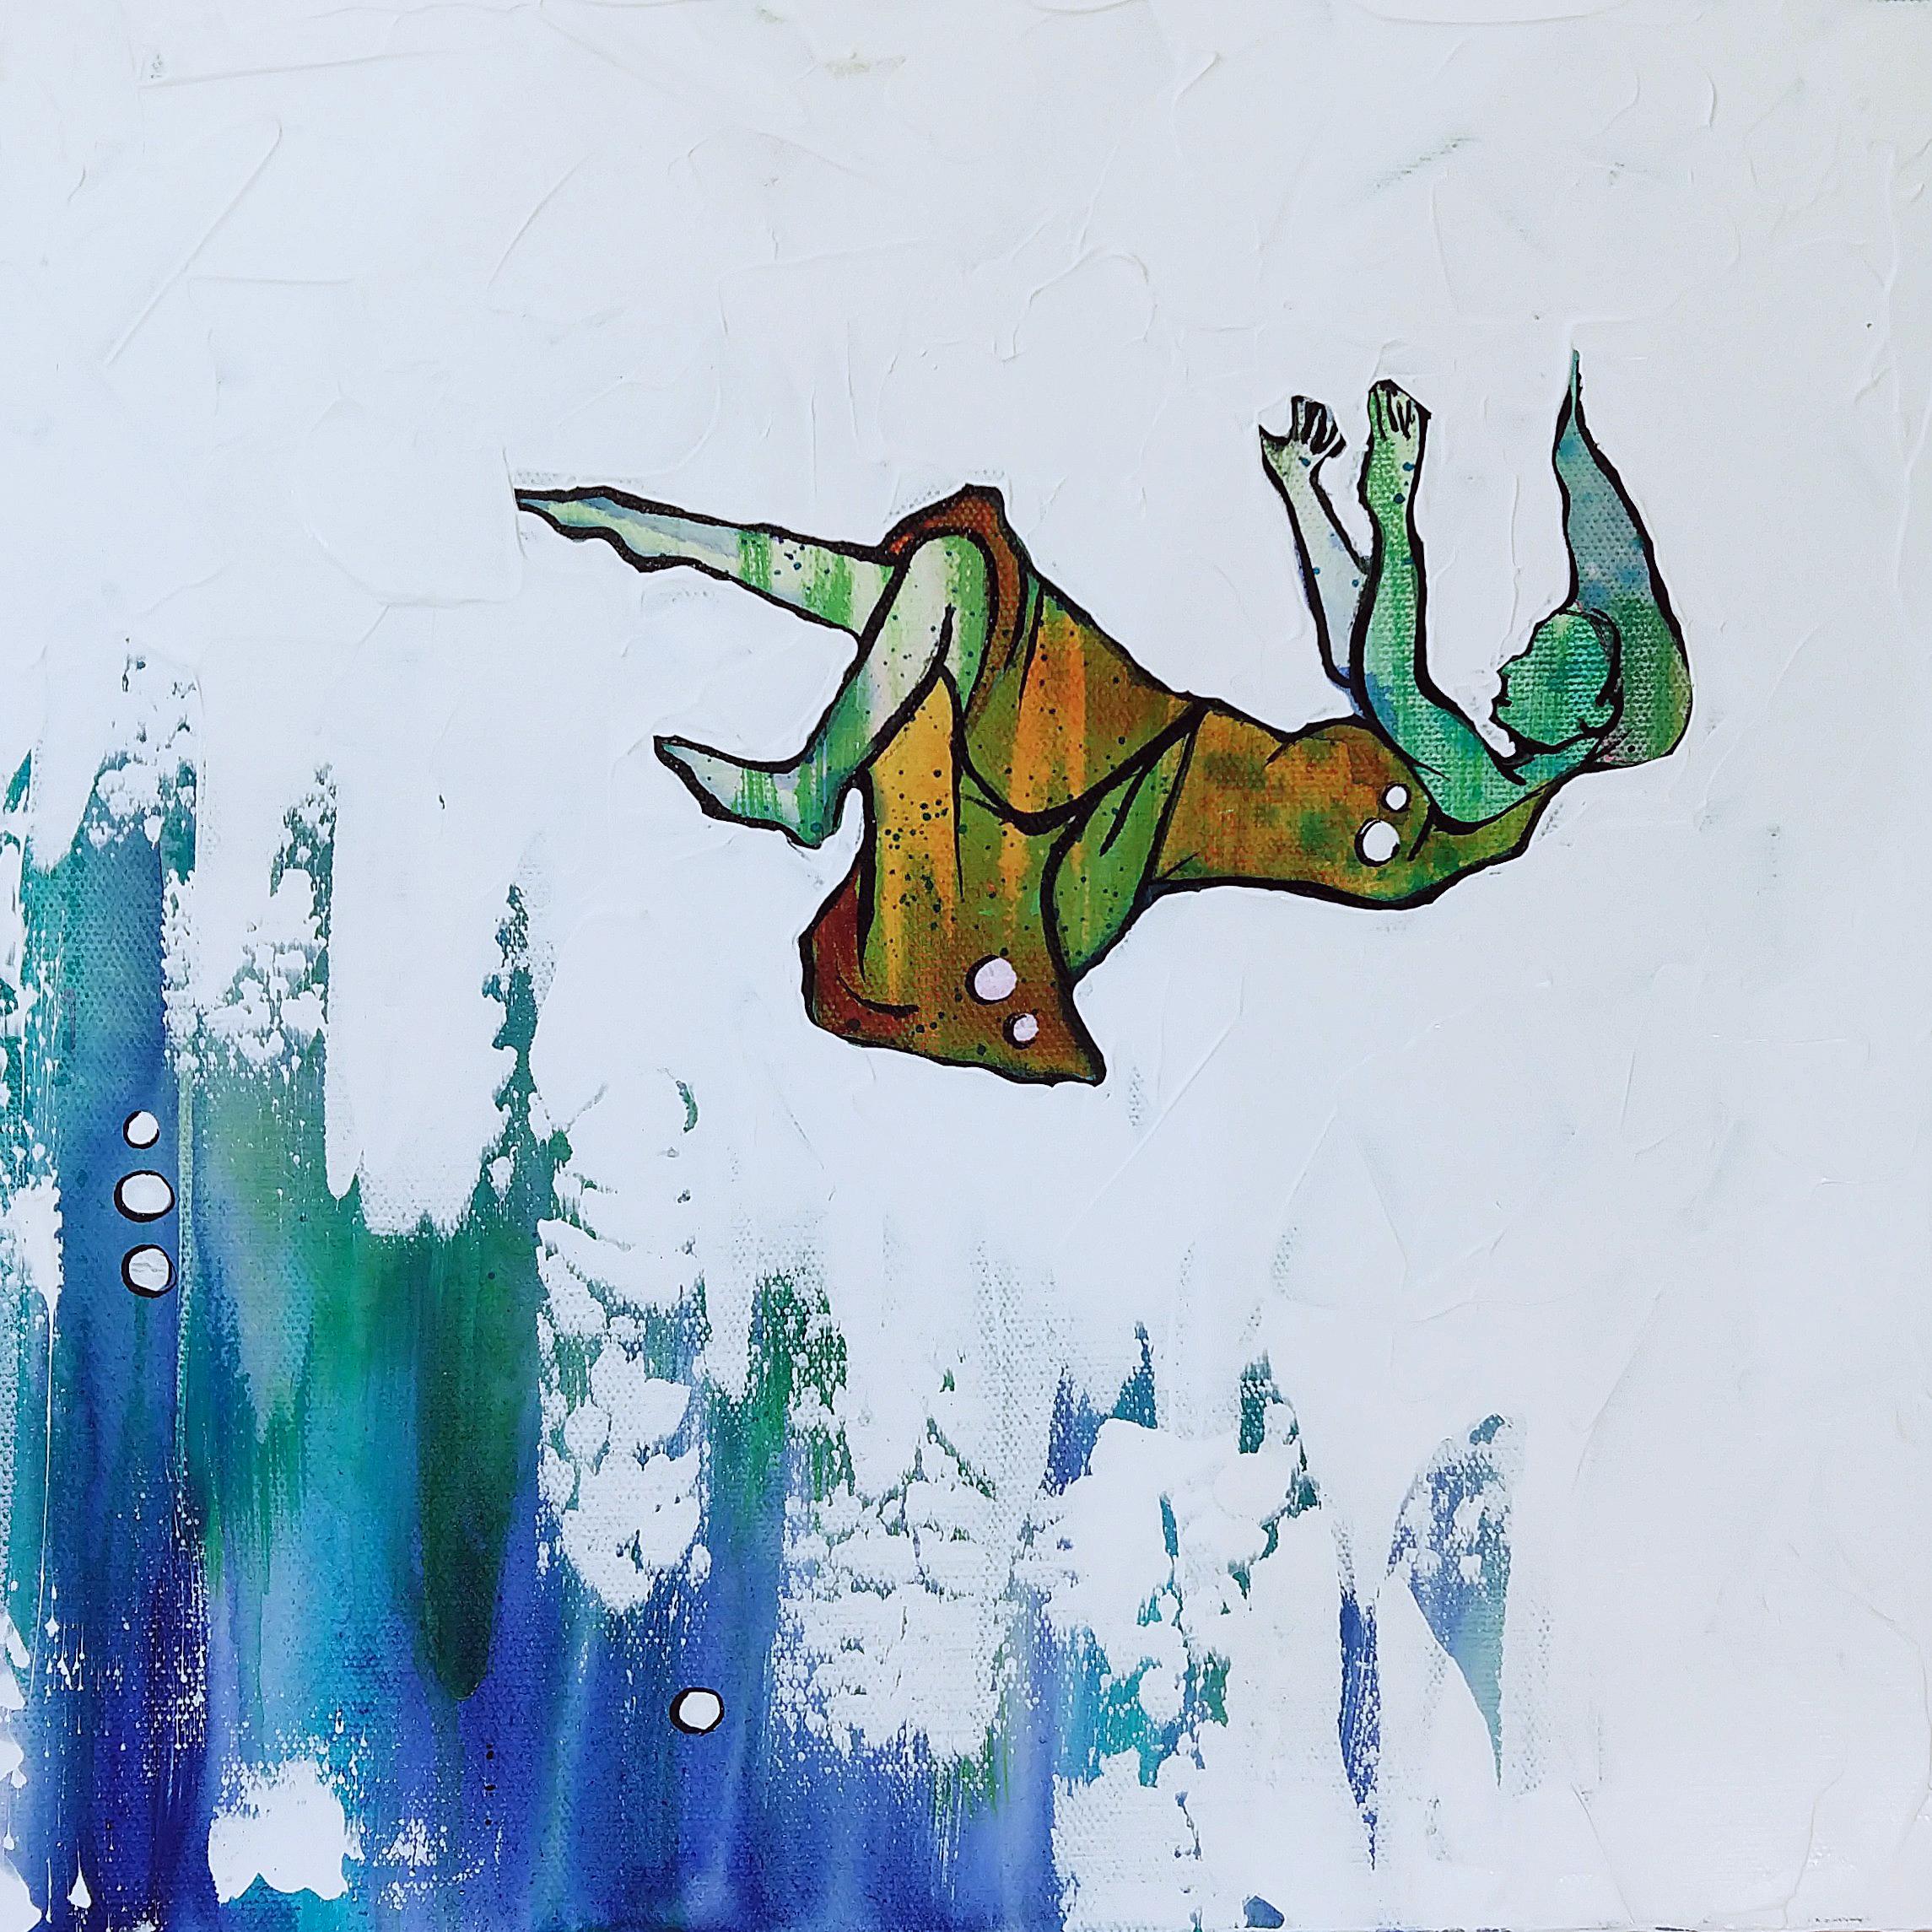 Float   |  12 x 12 inch acrylic on canvas